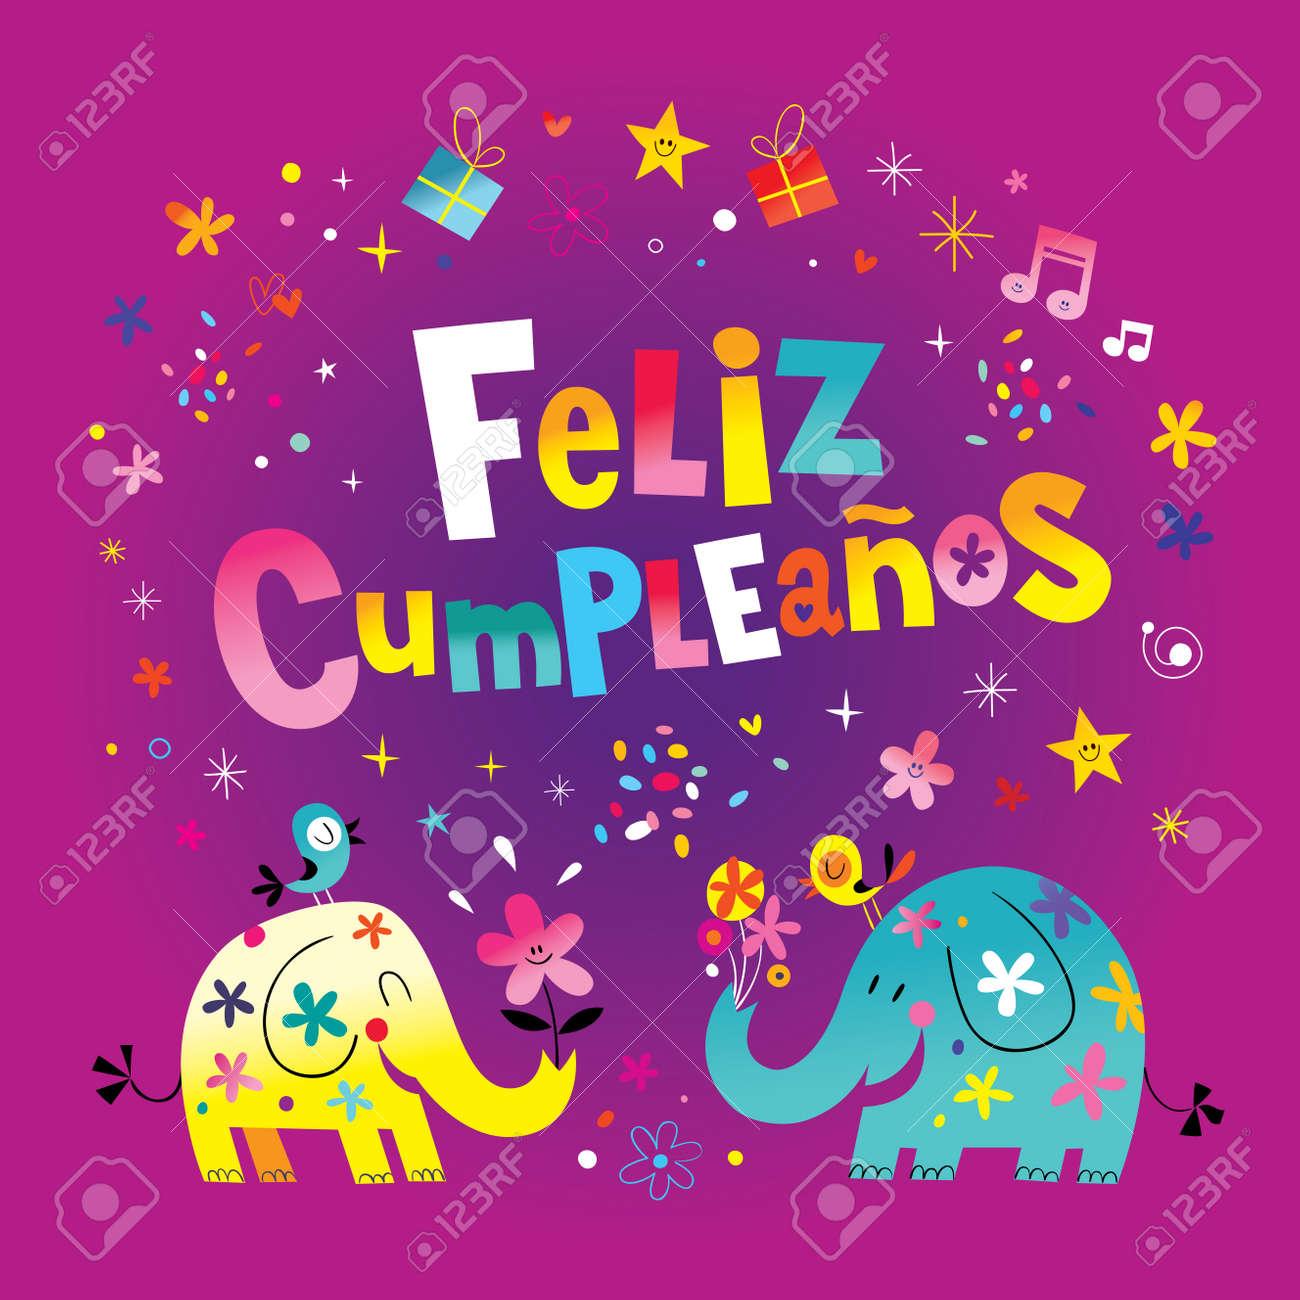 Feliz cumpleanos happy birthday in spanish greeting card with feliz cumpleanos happy birthday in spanish greeting card with cute elephants stock vector 80121370 bookmarktalkfo Images